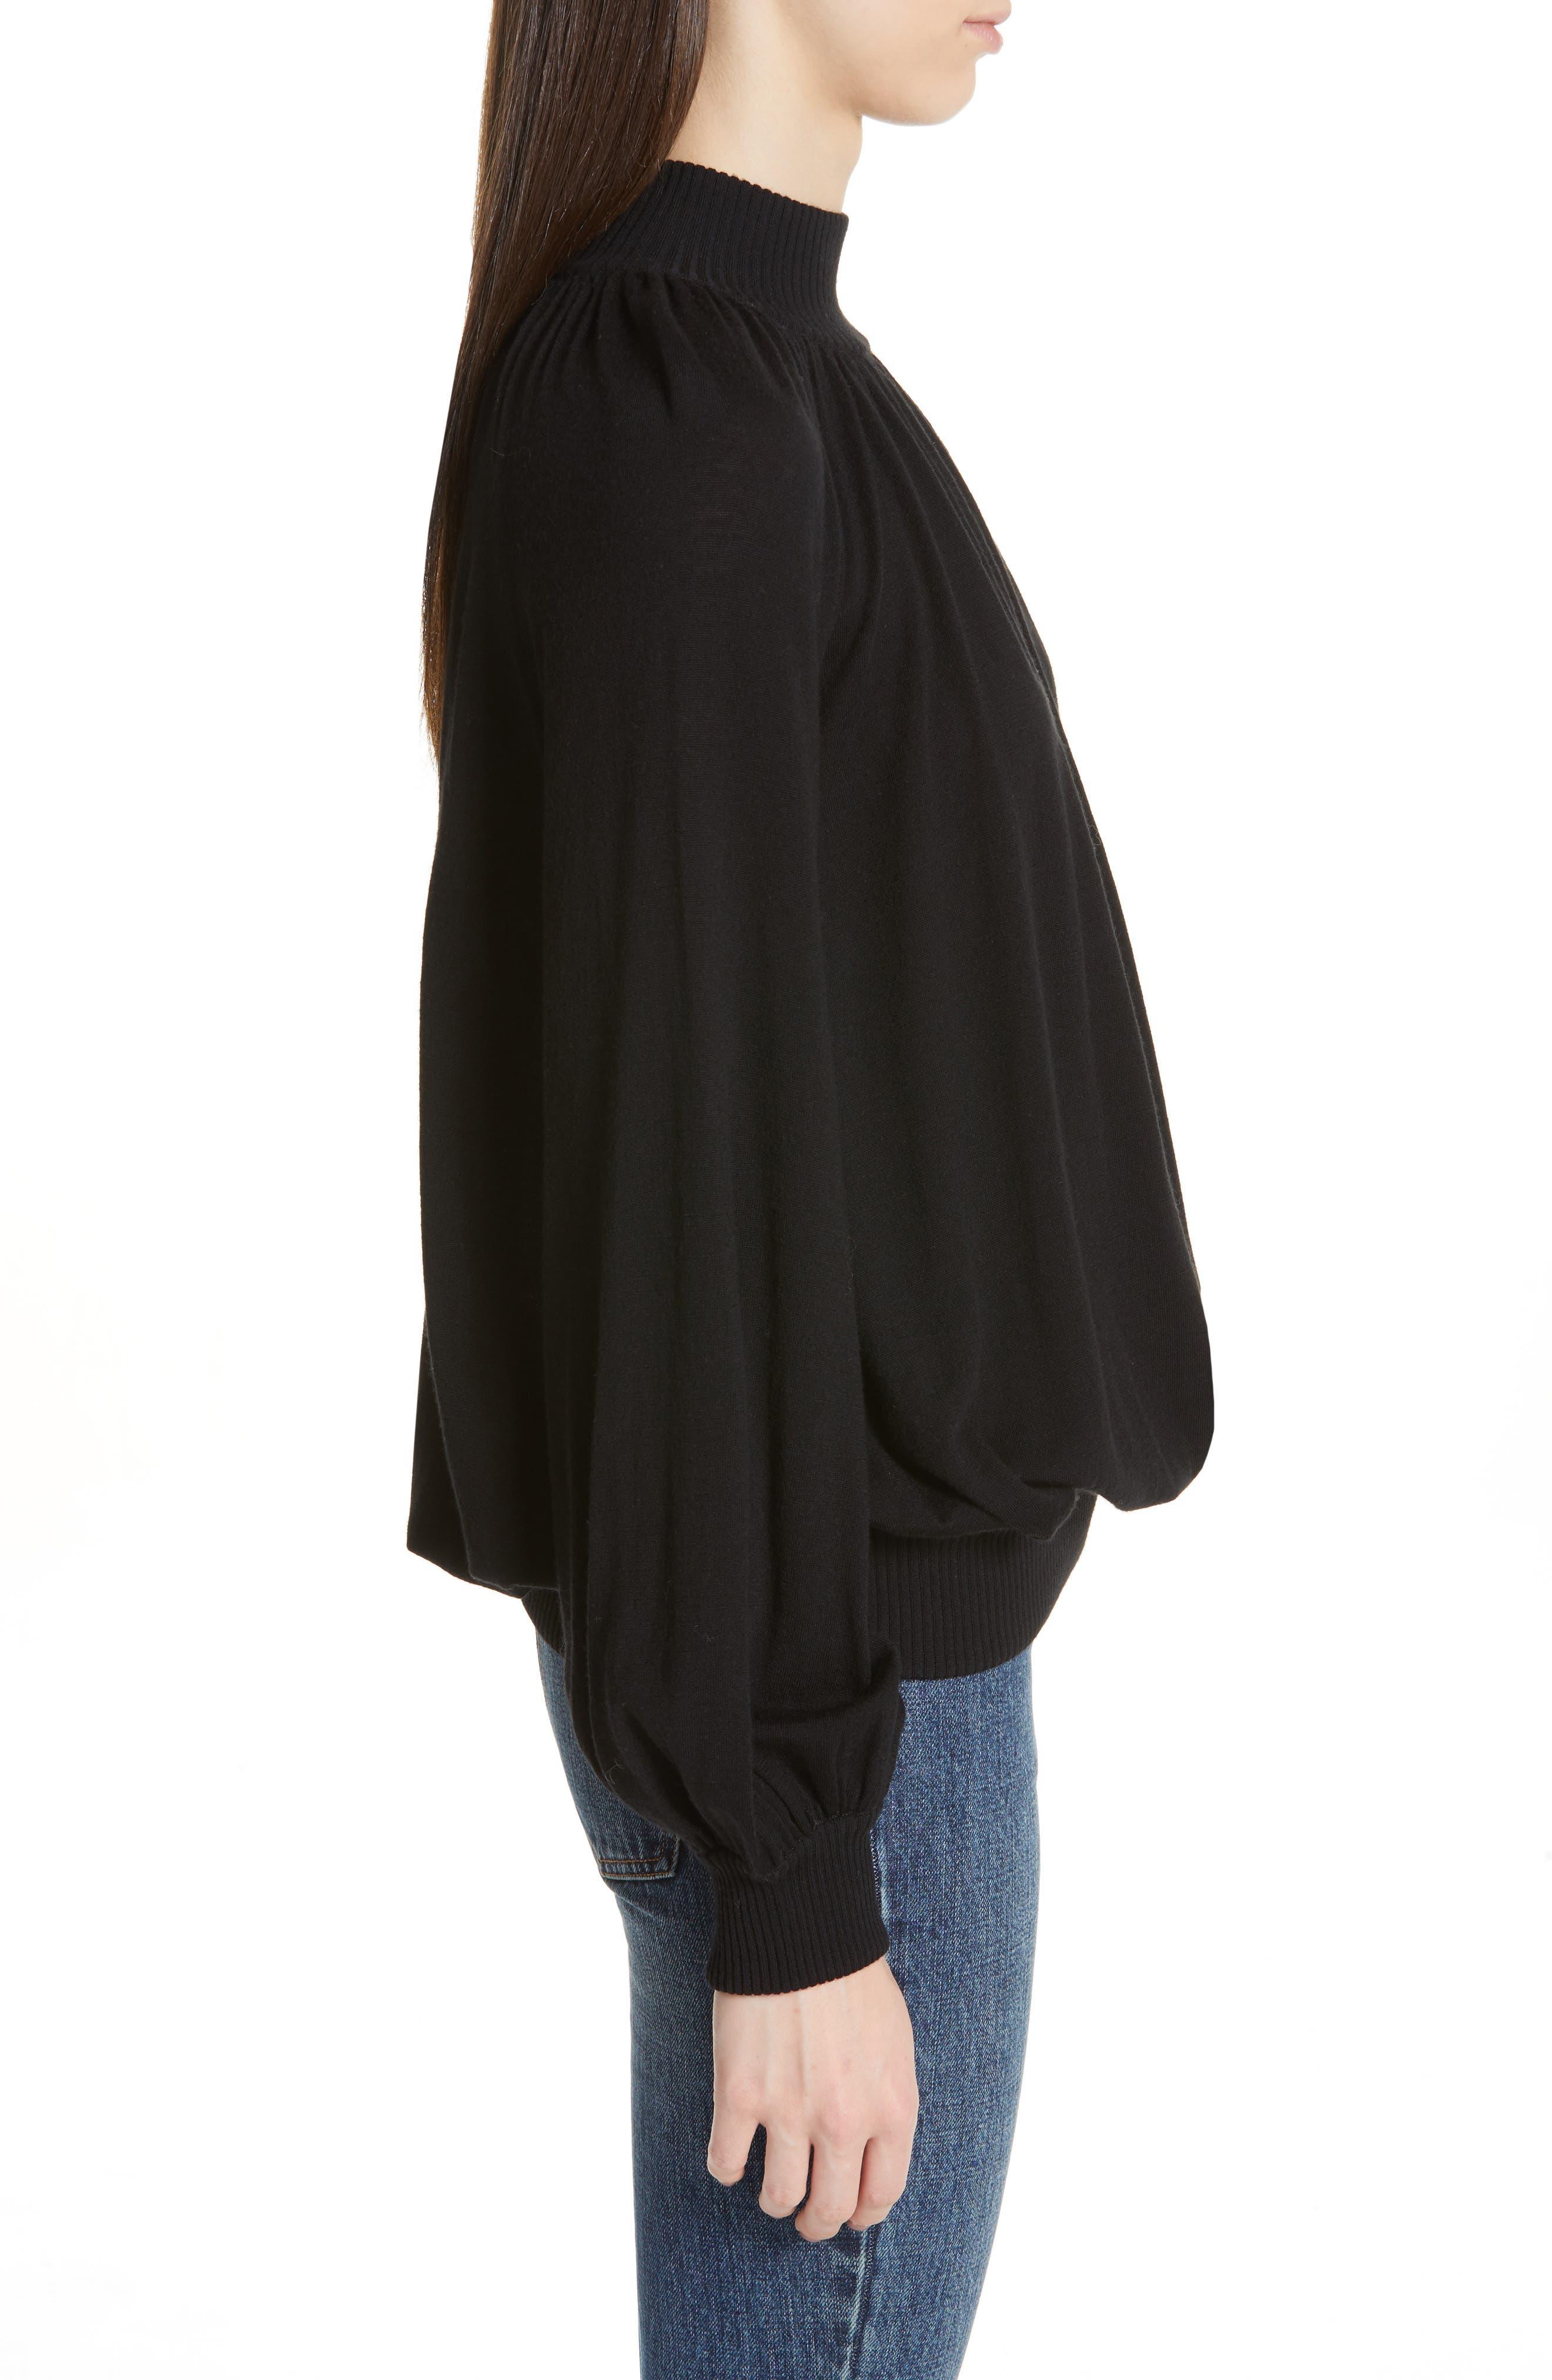 CO, Cashmere High Neck Blouson Sweater, Alternate thumbnail 3, color, BLACK